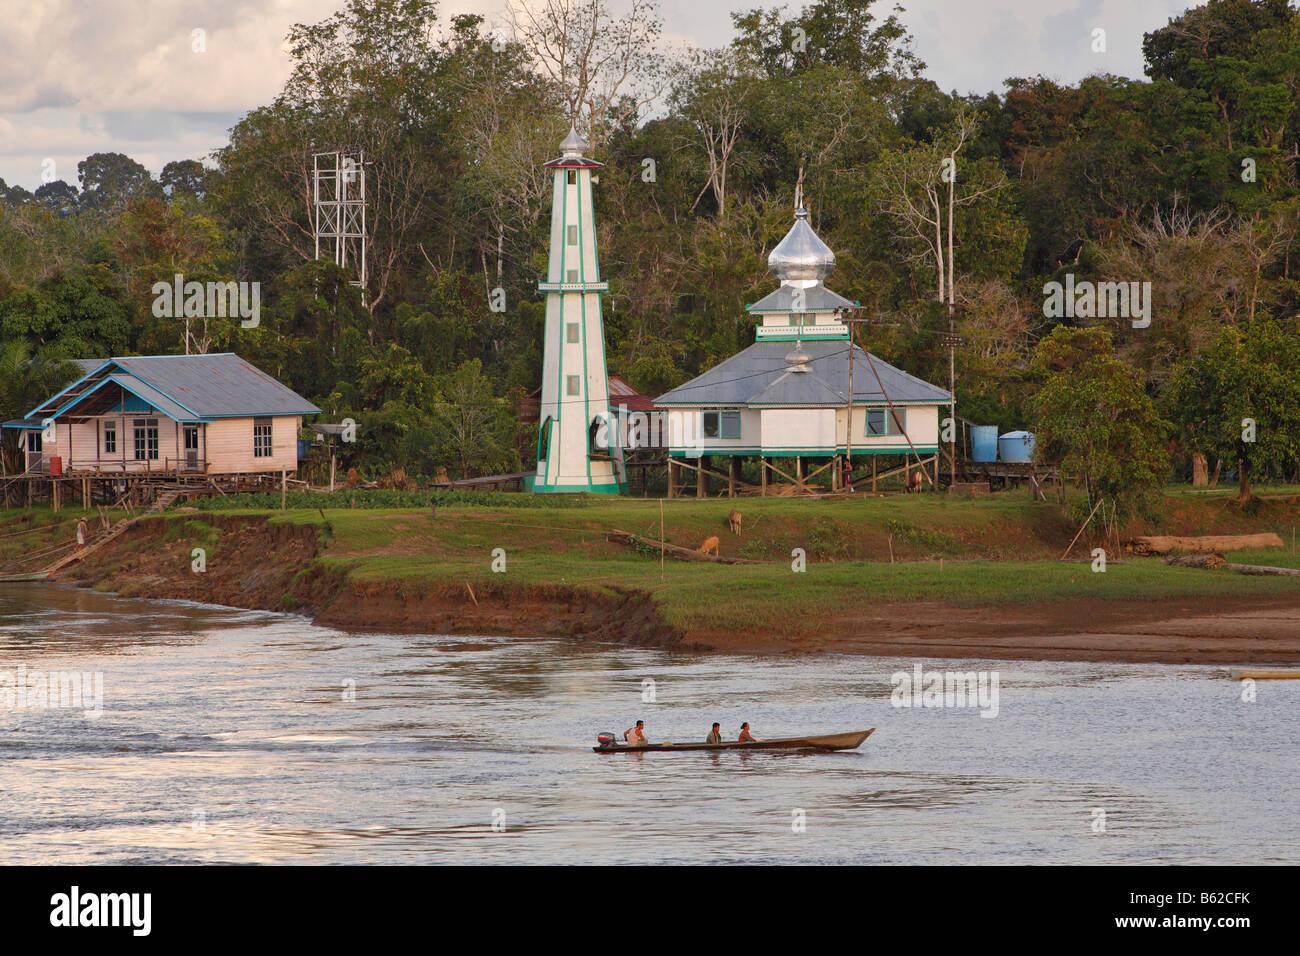 Mosque by the Sungai Kapuas River, Putussibau, West Kalimantan, Borneo, Indonesia, Asia - Stock Image